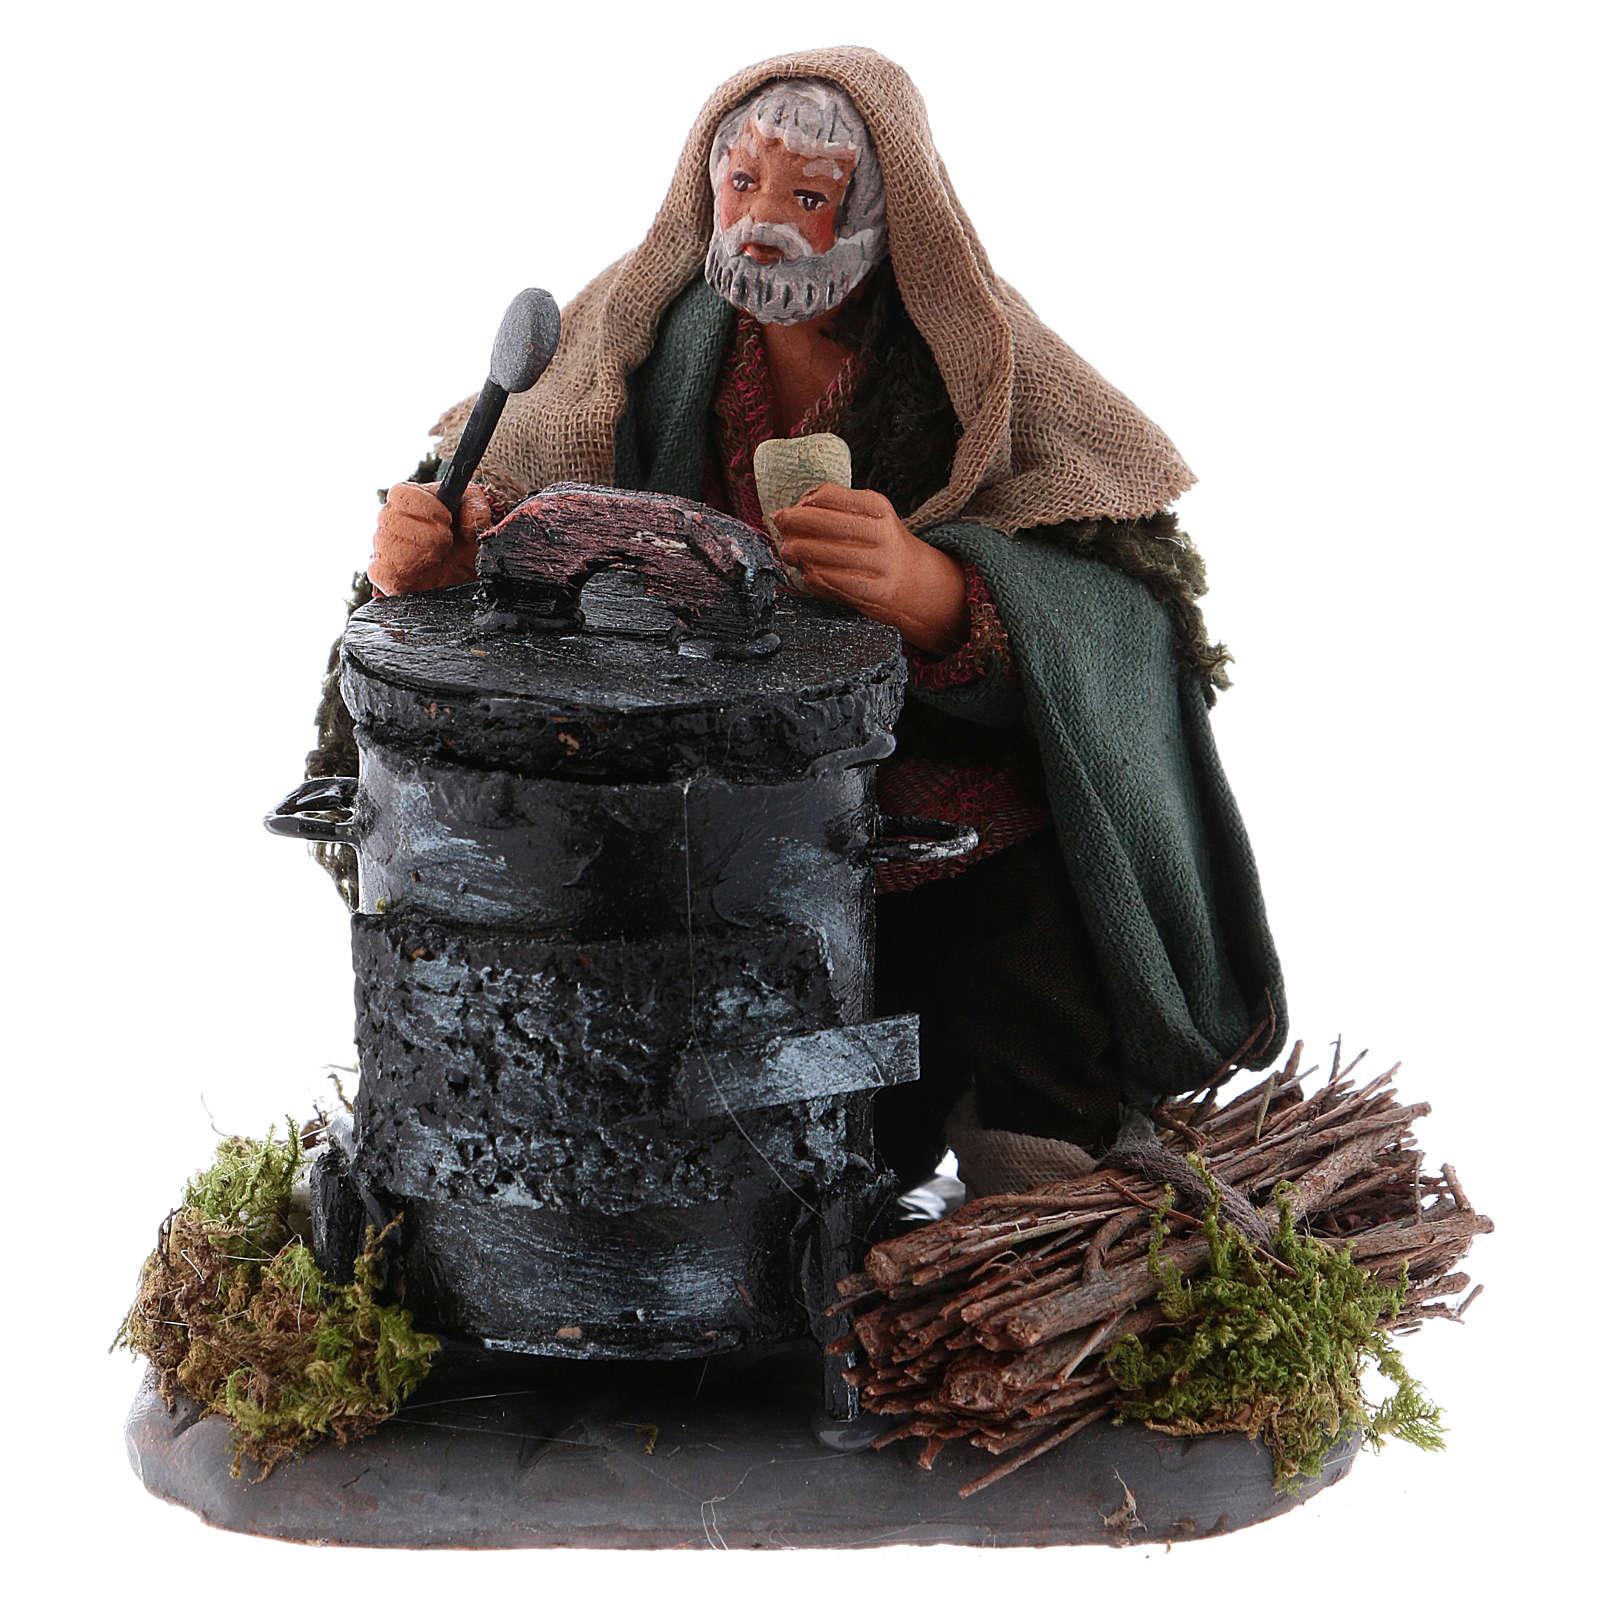 Chestnut seller with fire, Neapolitan Nativity 10cm 4